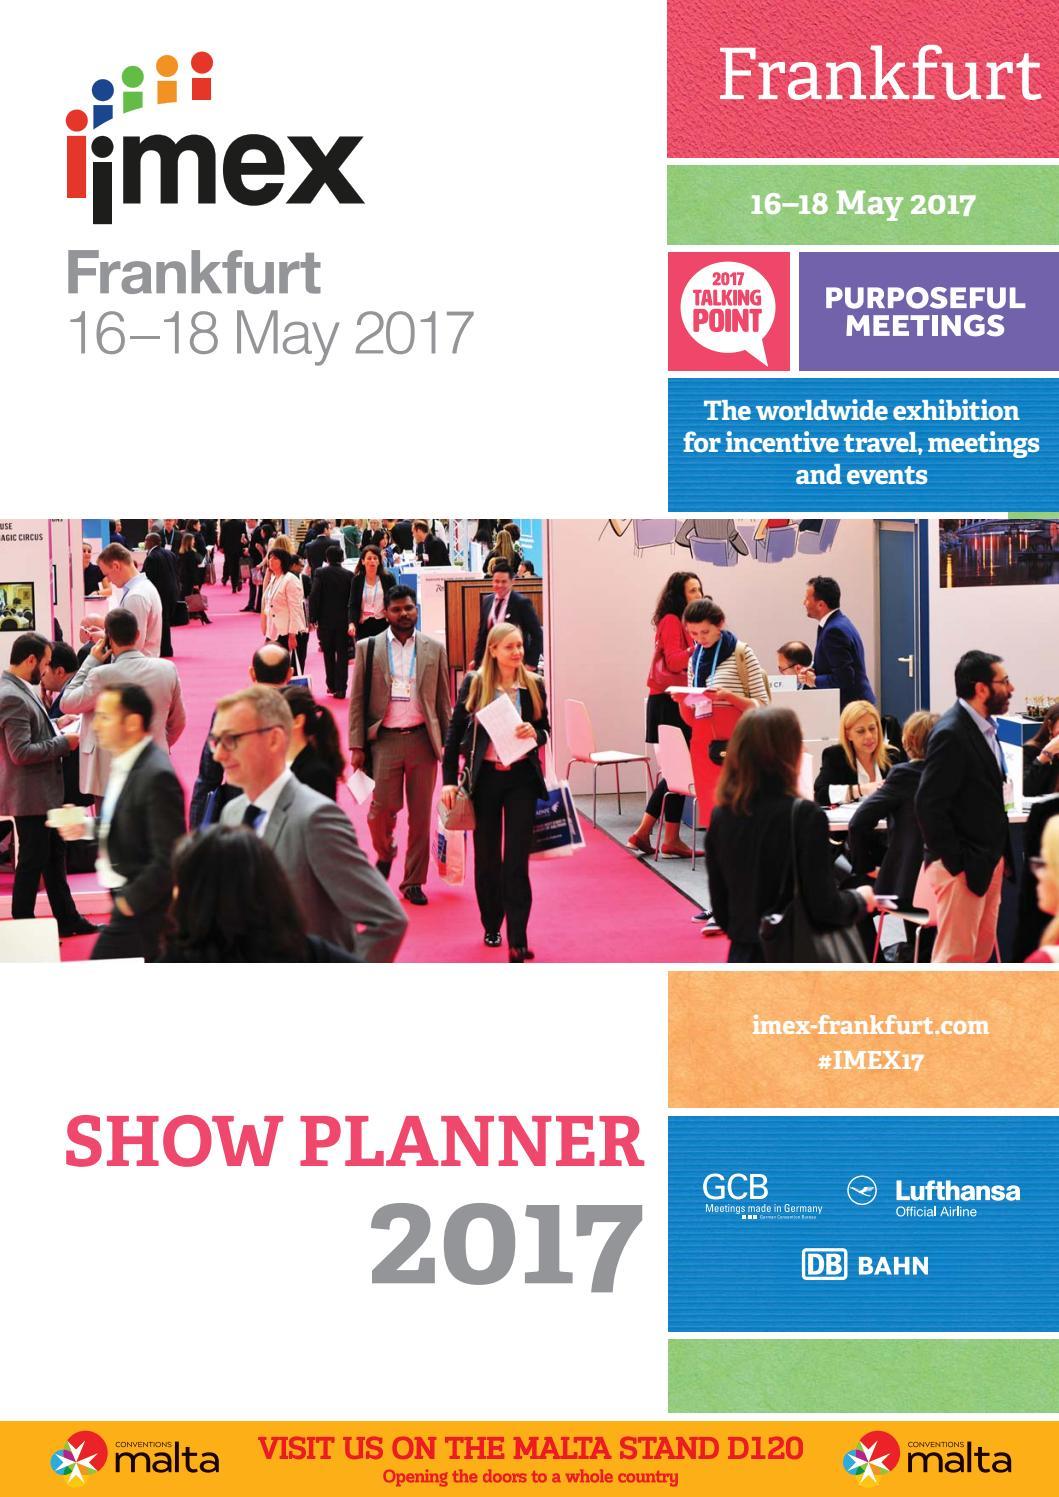 Imex Show Planner 2017 by Upper Street Media - issuu